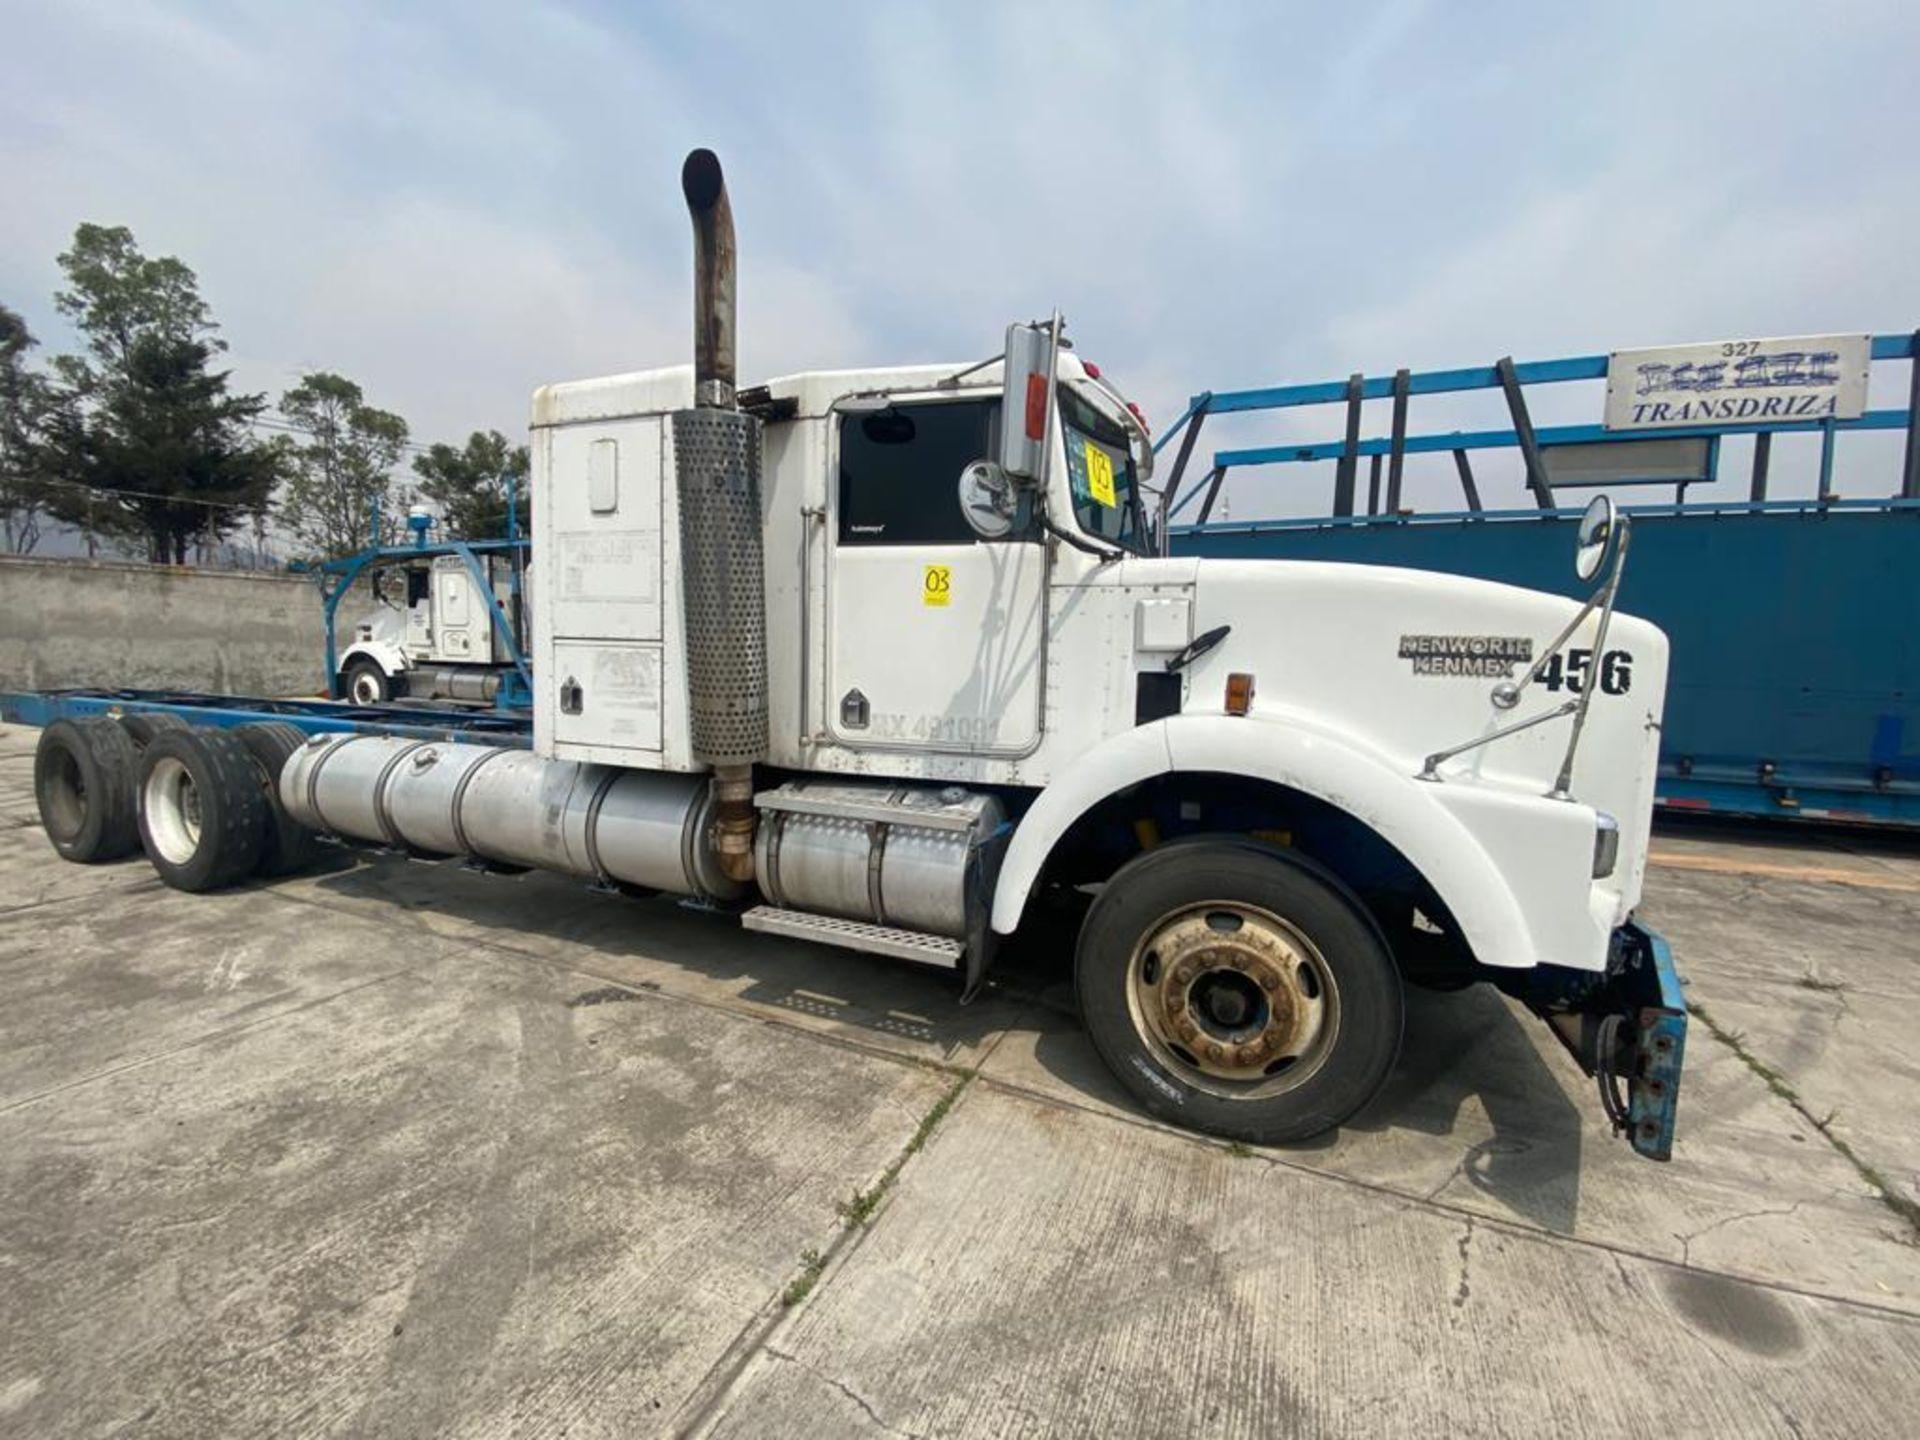 1999 Kenworth Sleeper truck tractor, standard transmission of 18 speeds - Image 23 of 62